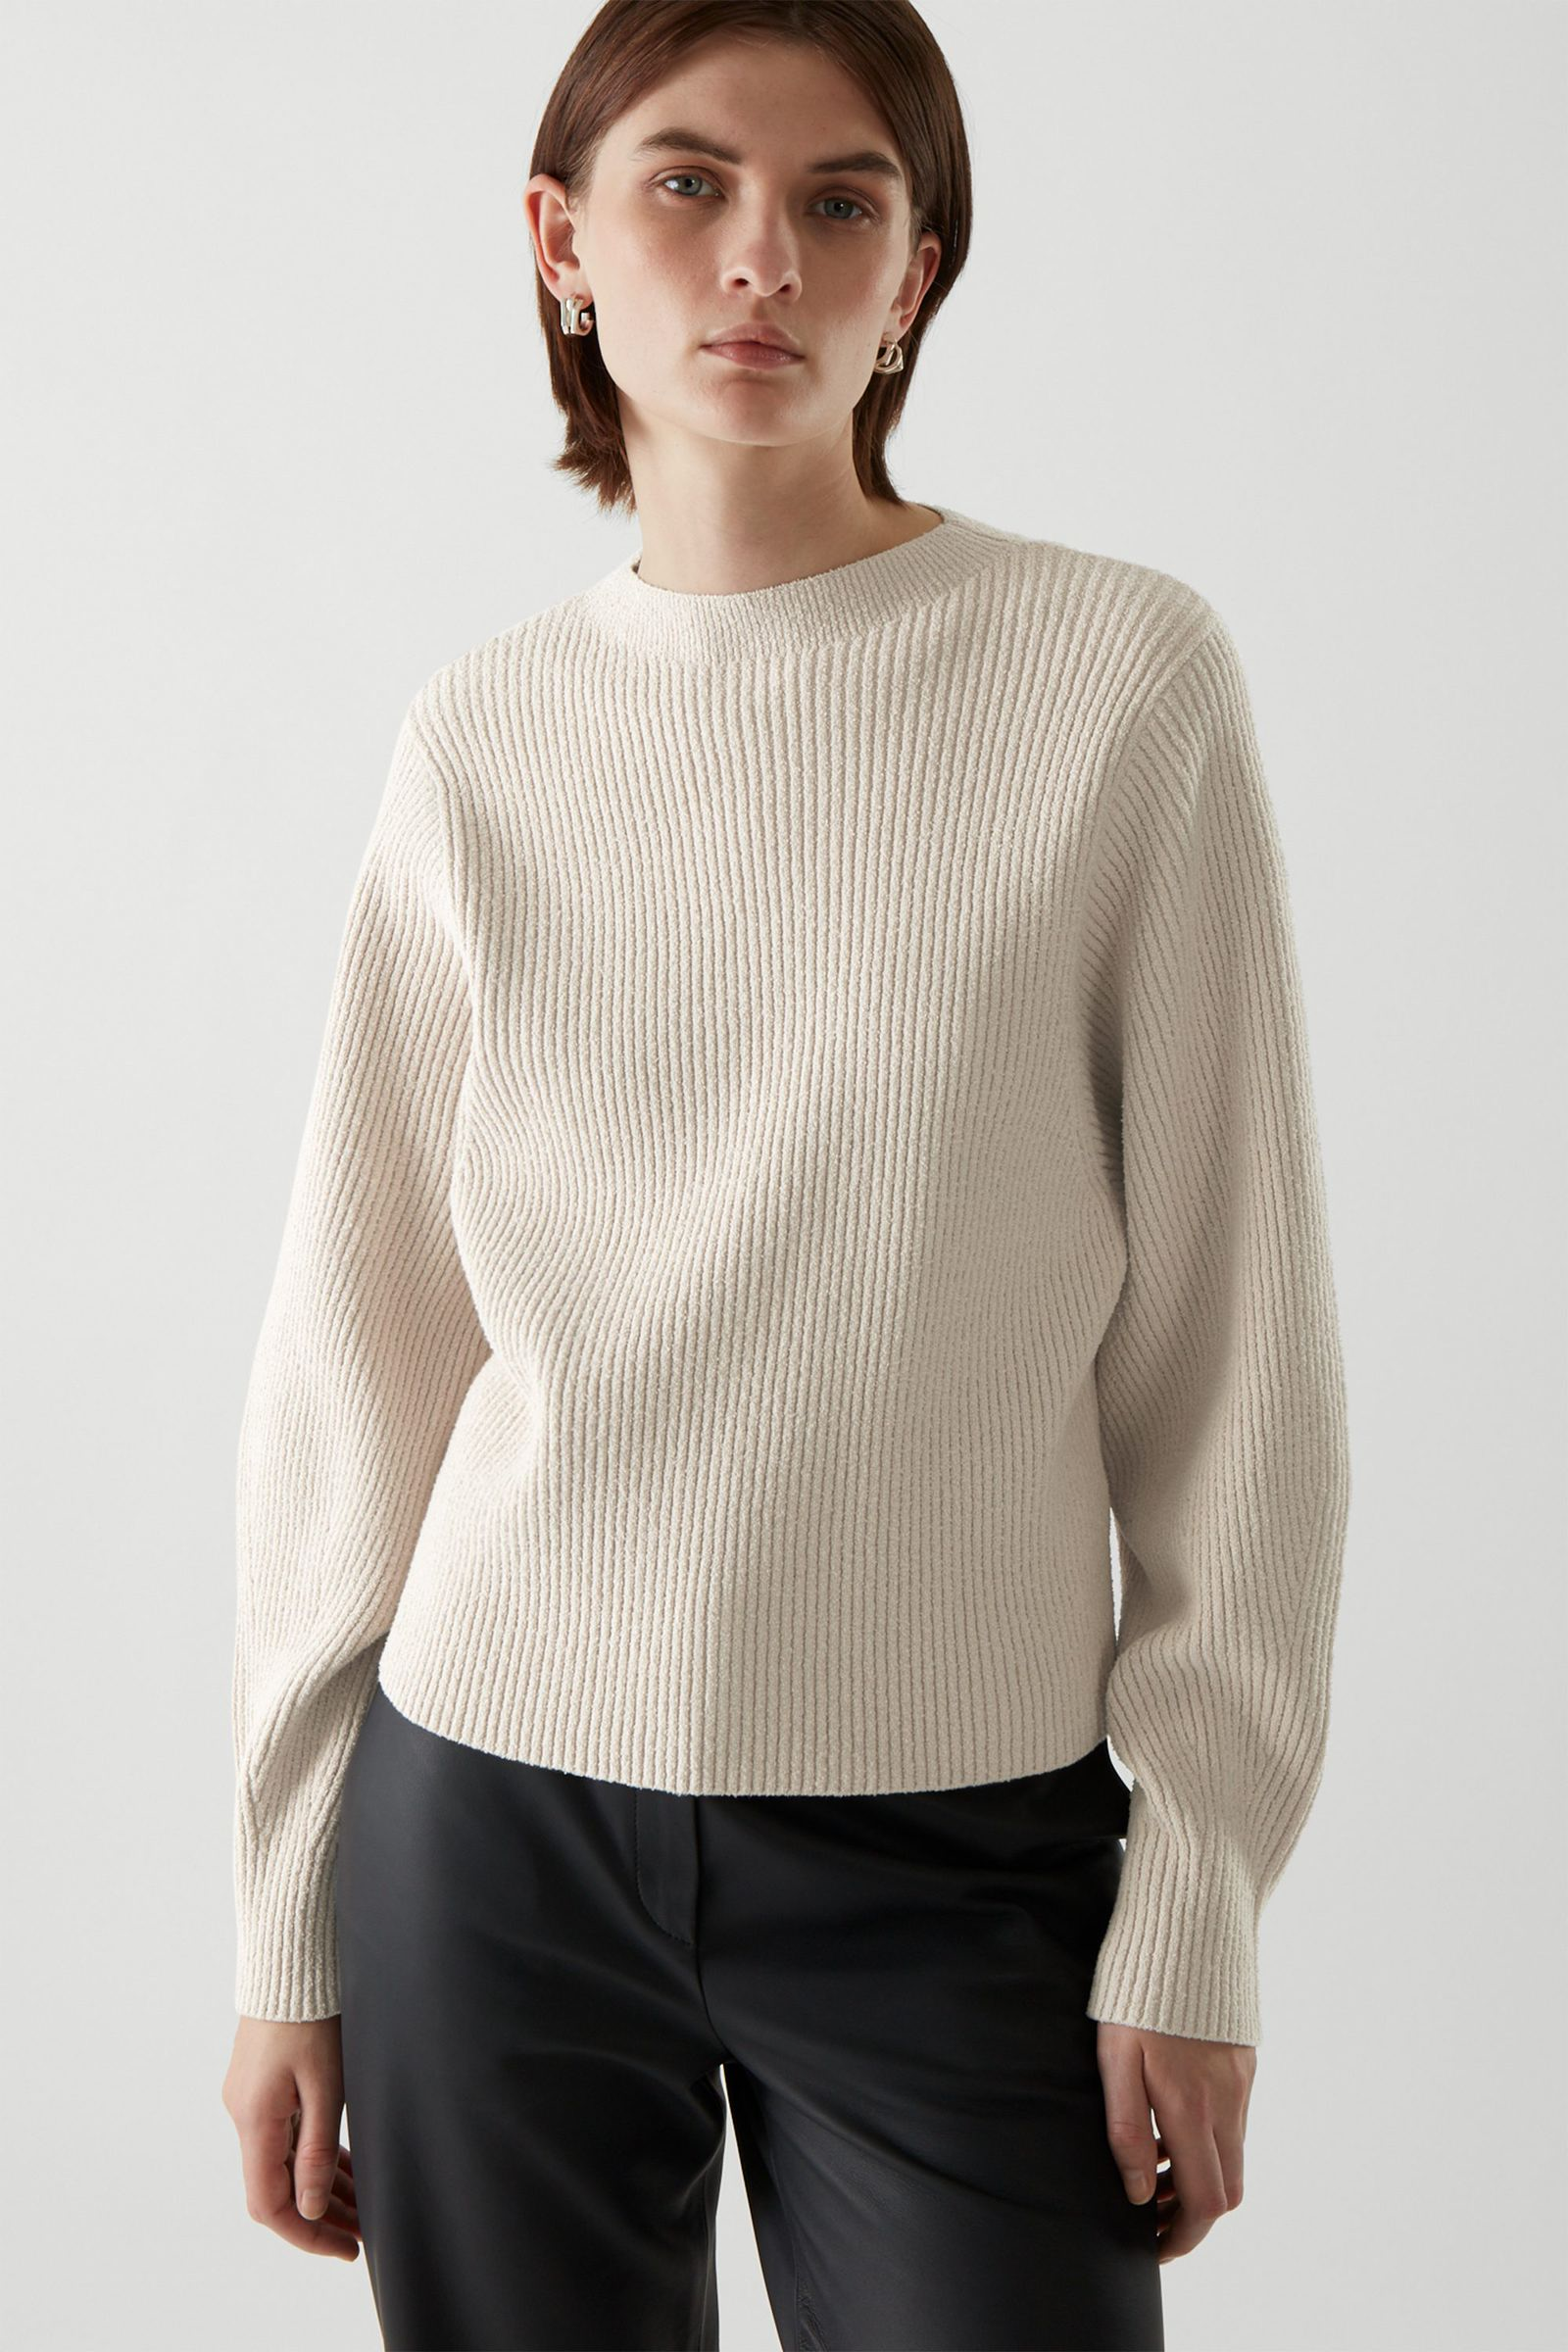 COS 리브드 니트 스웨터의 베이지컬러 ECOMLook입니다.